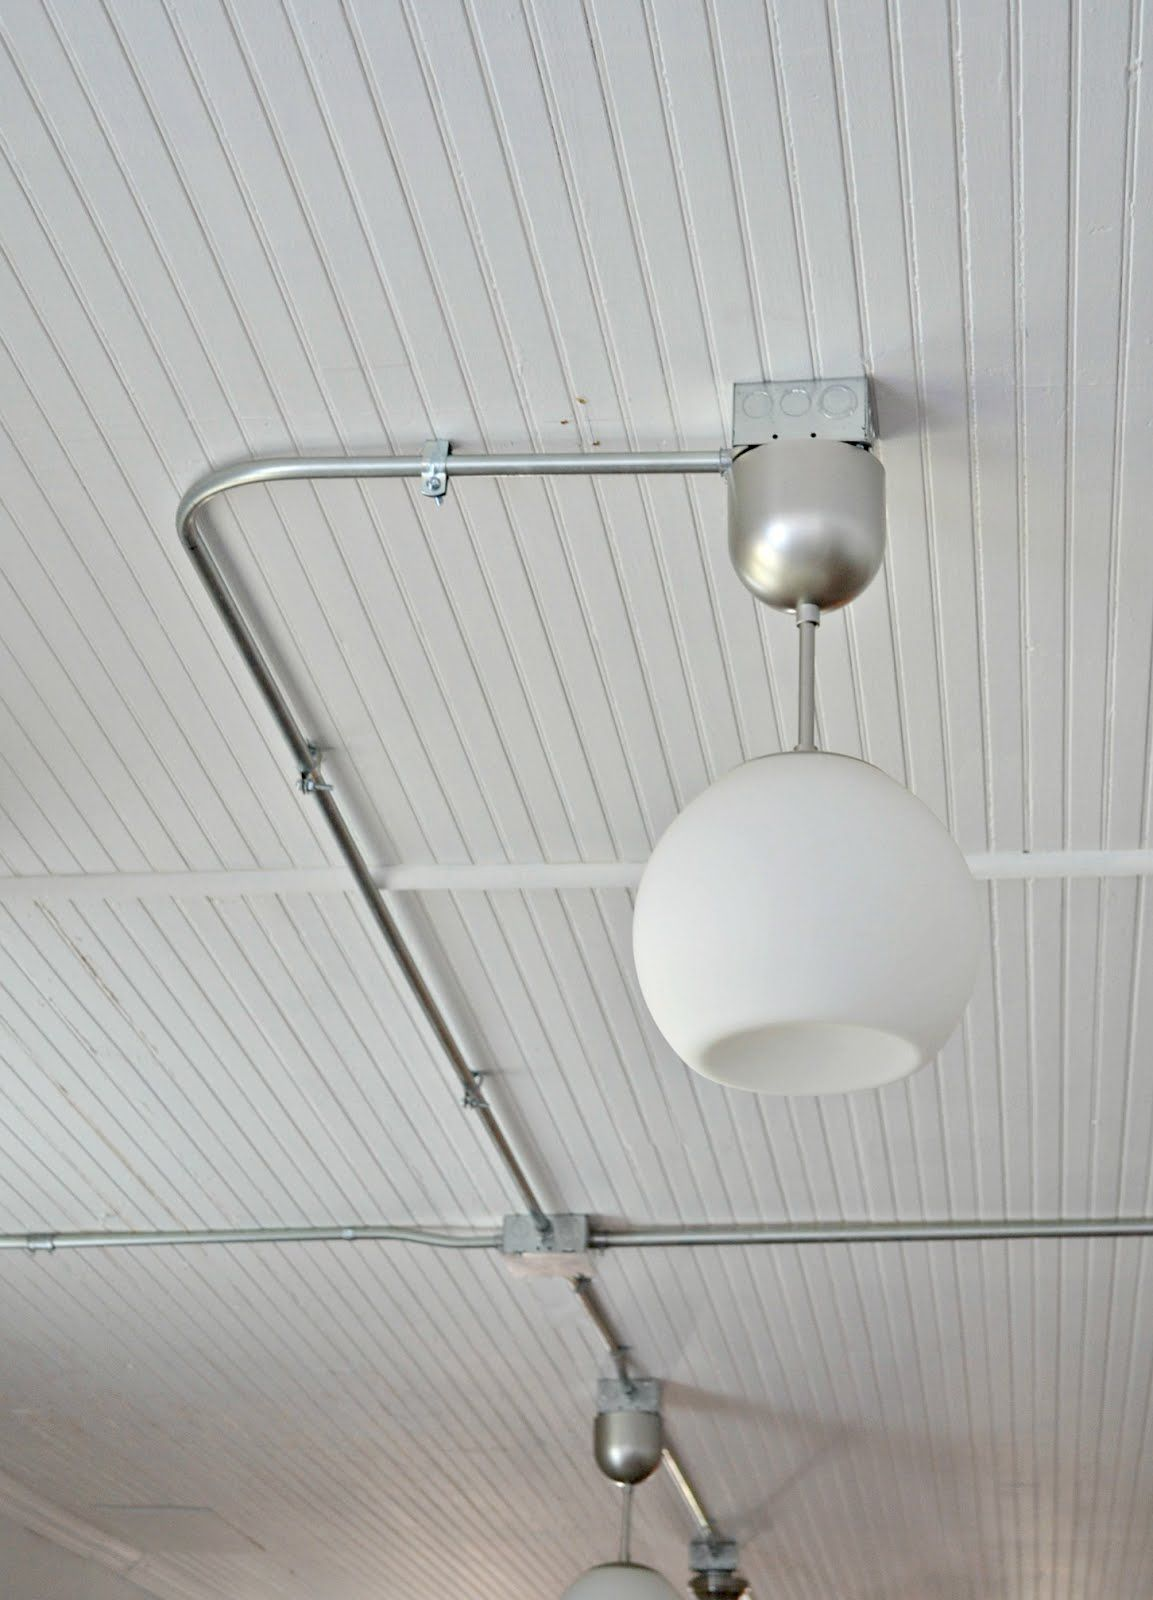 exposed conduit lighting. industrial exposed lighting pkan to gi in gym conduit